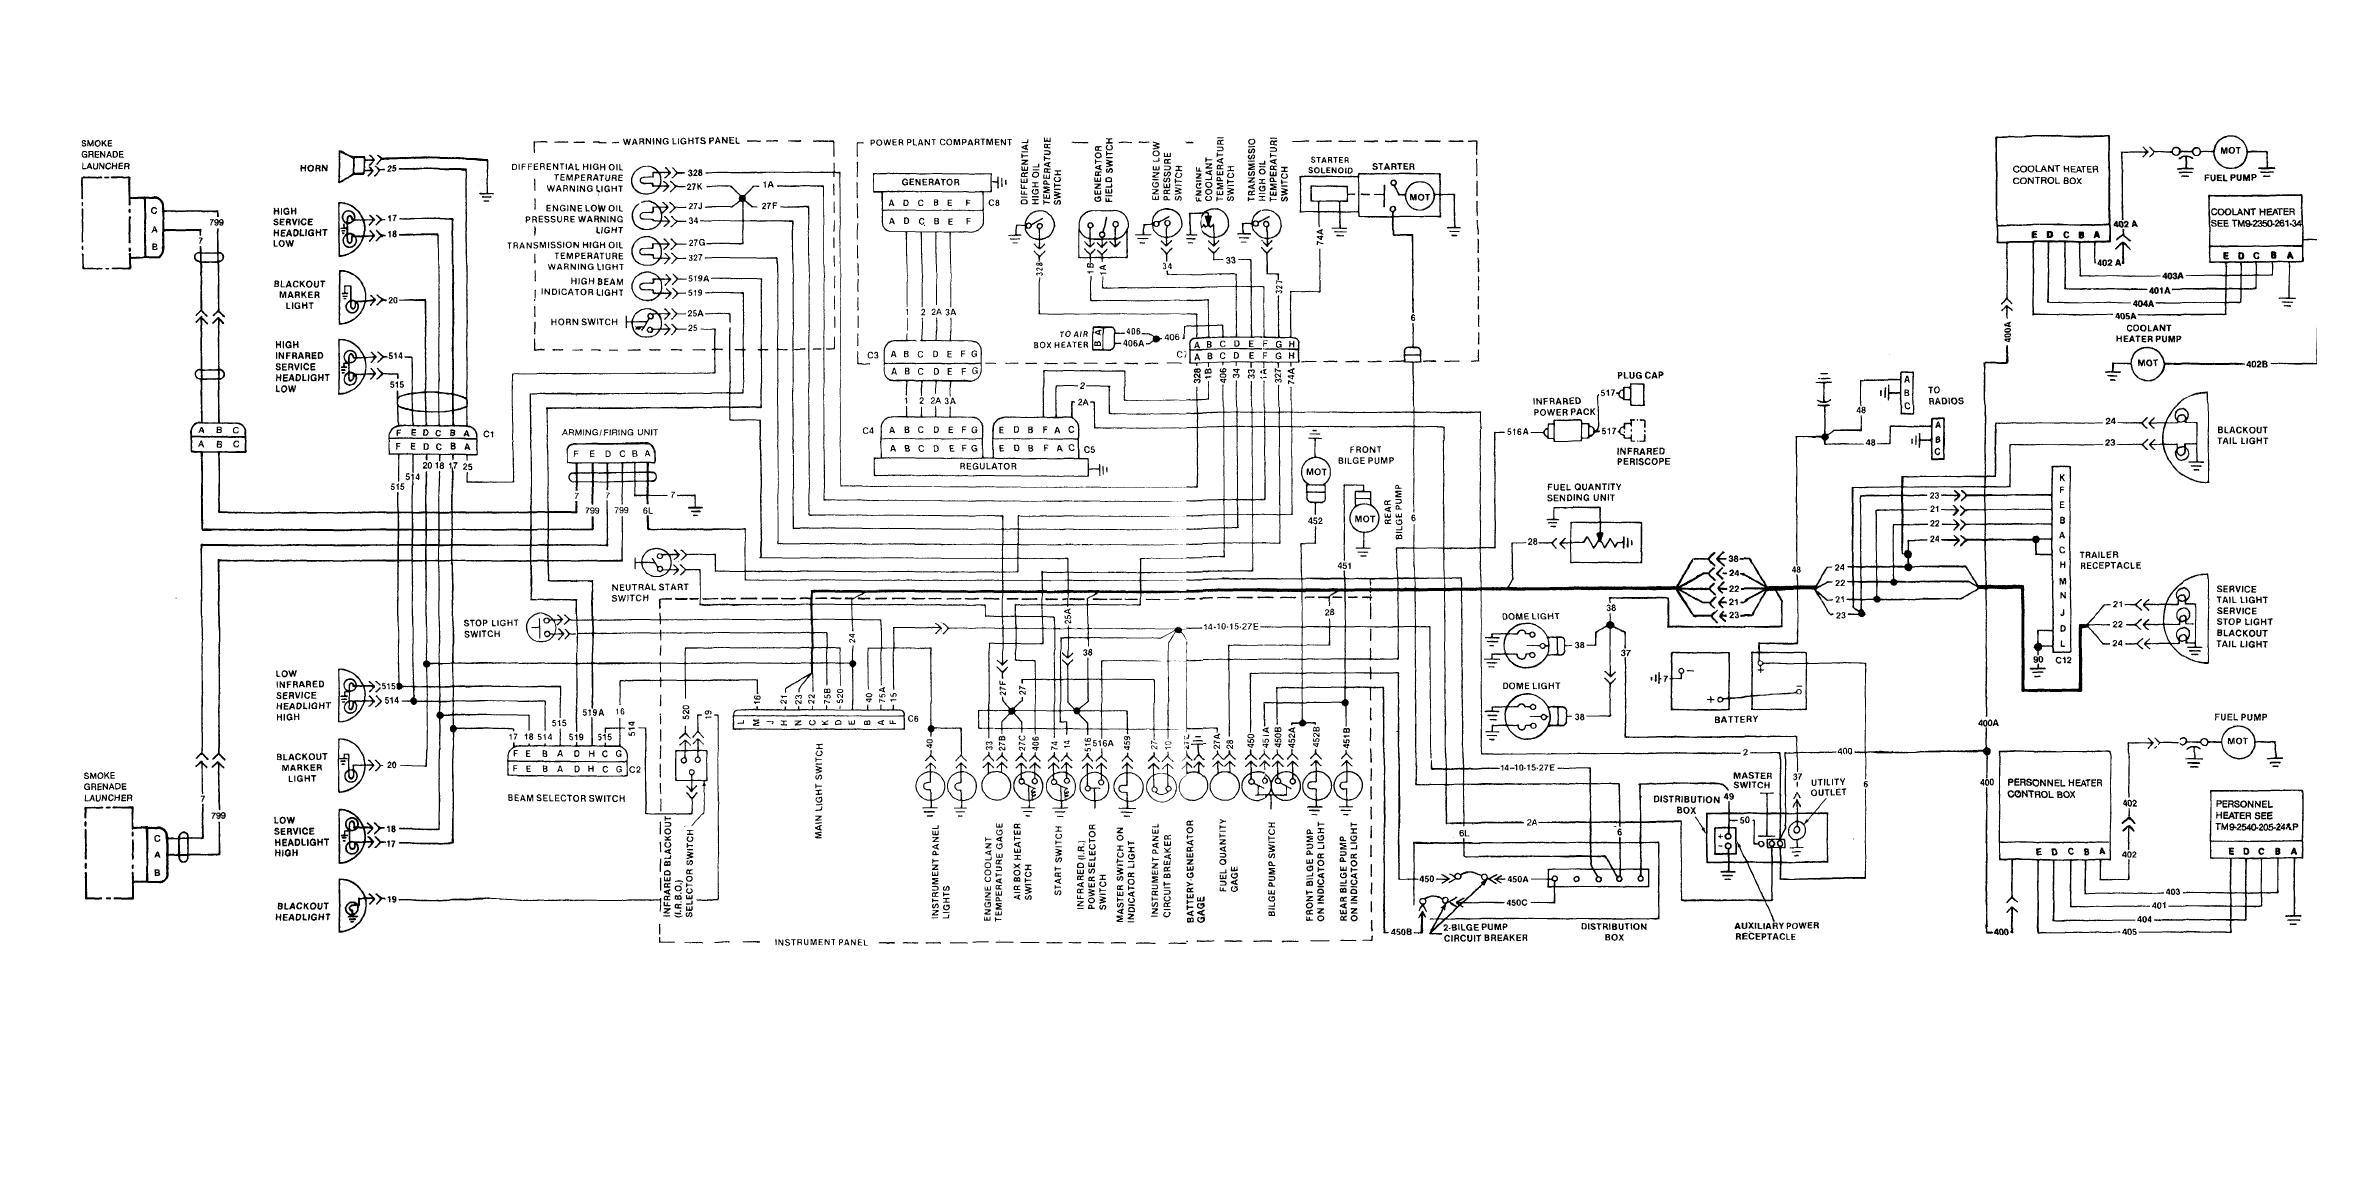 0825760739im?resize=665%2C333 limitorque l120 20 wiring diagram wiring diagram limitorque l120 20 wiring diagram at n-0.co